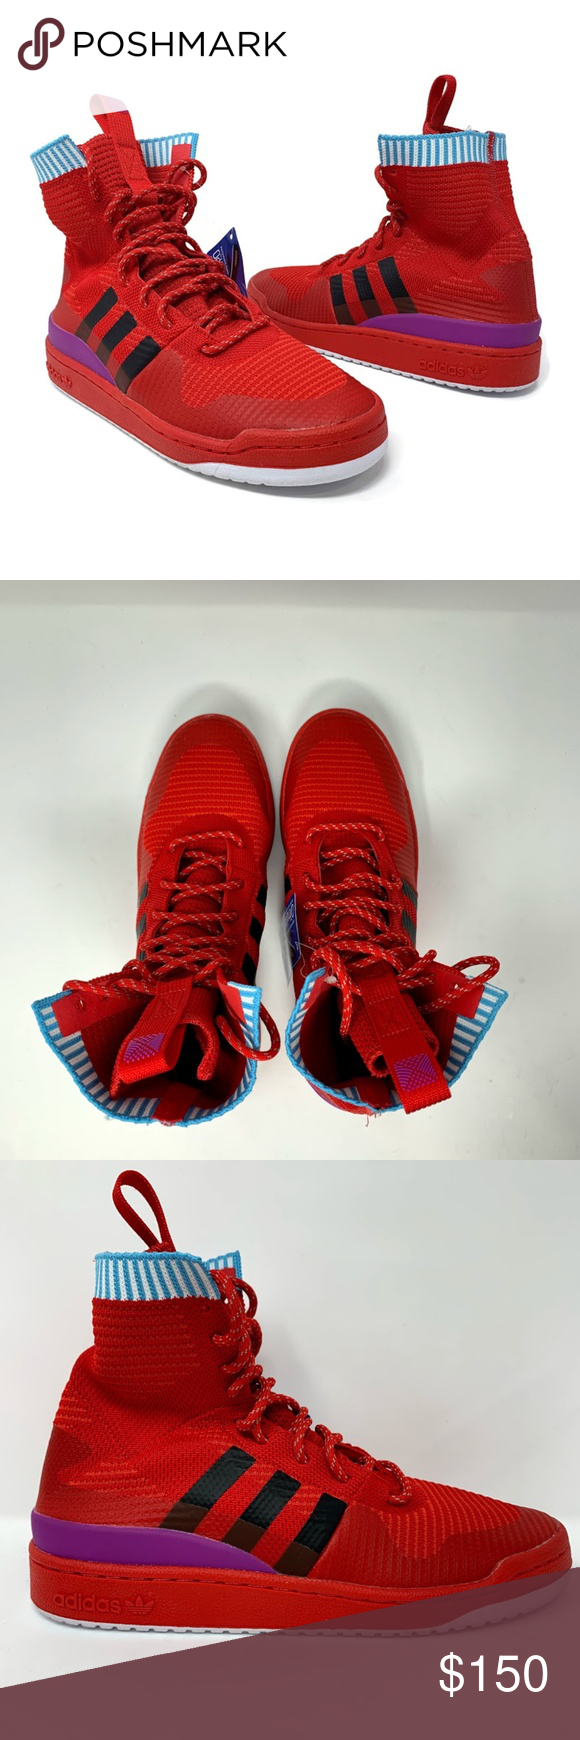 Adidas Forum Winter Pk Men S Basketball Shoes Red High Tops Basketball Shoes Red Adidas [ 1740 x 580 Pixel ]